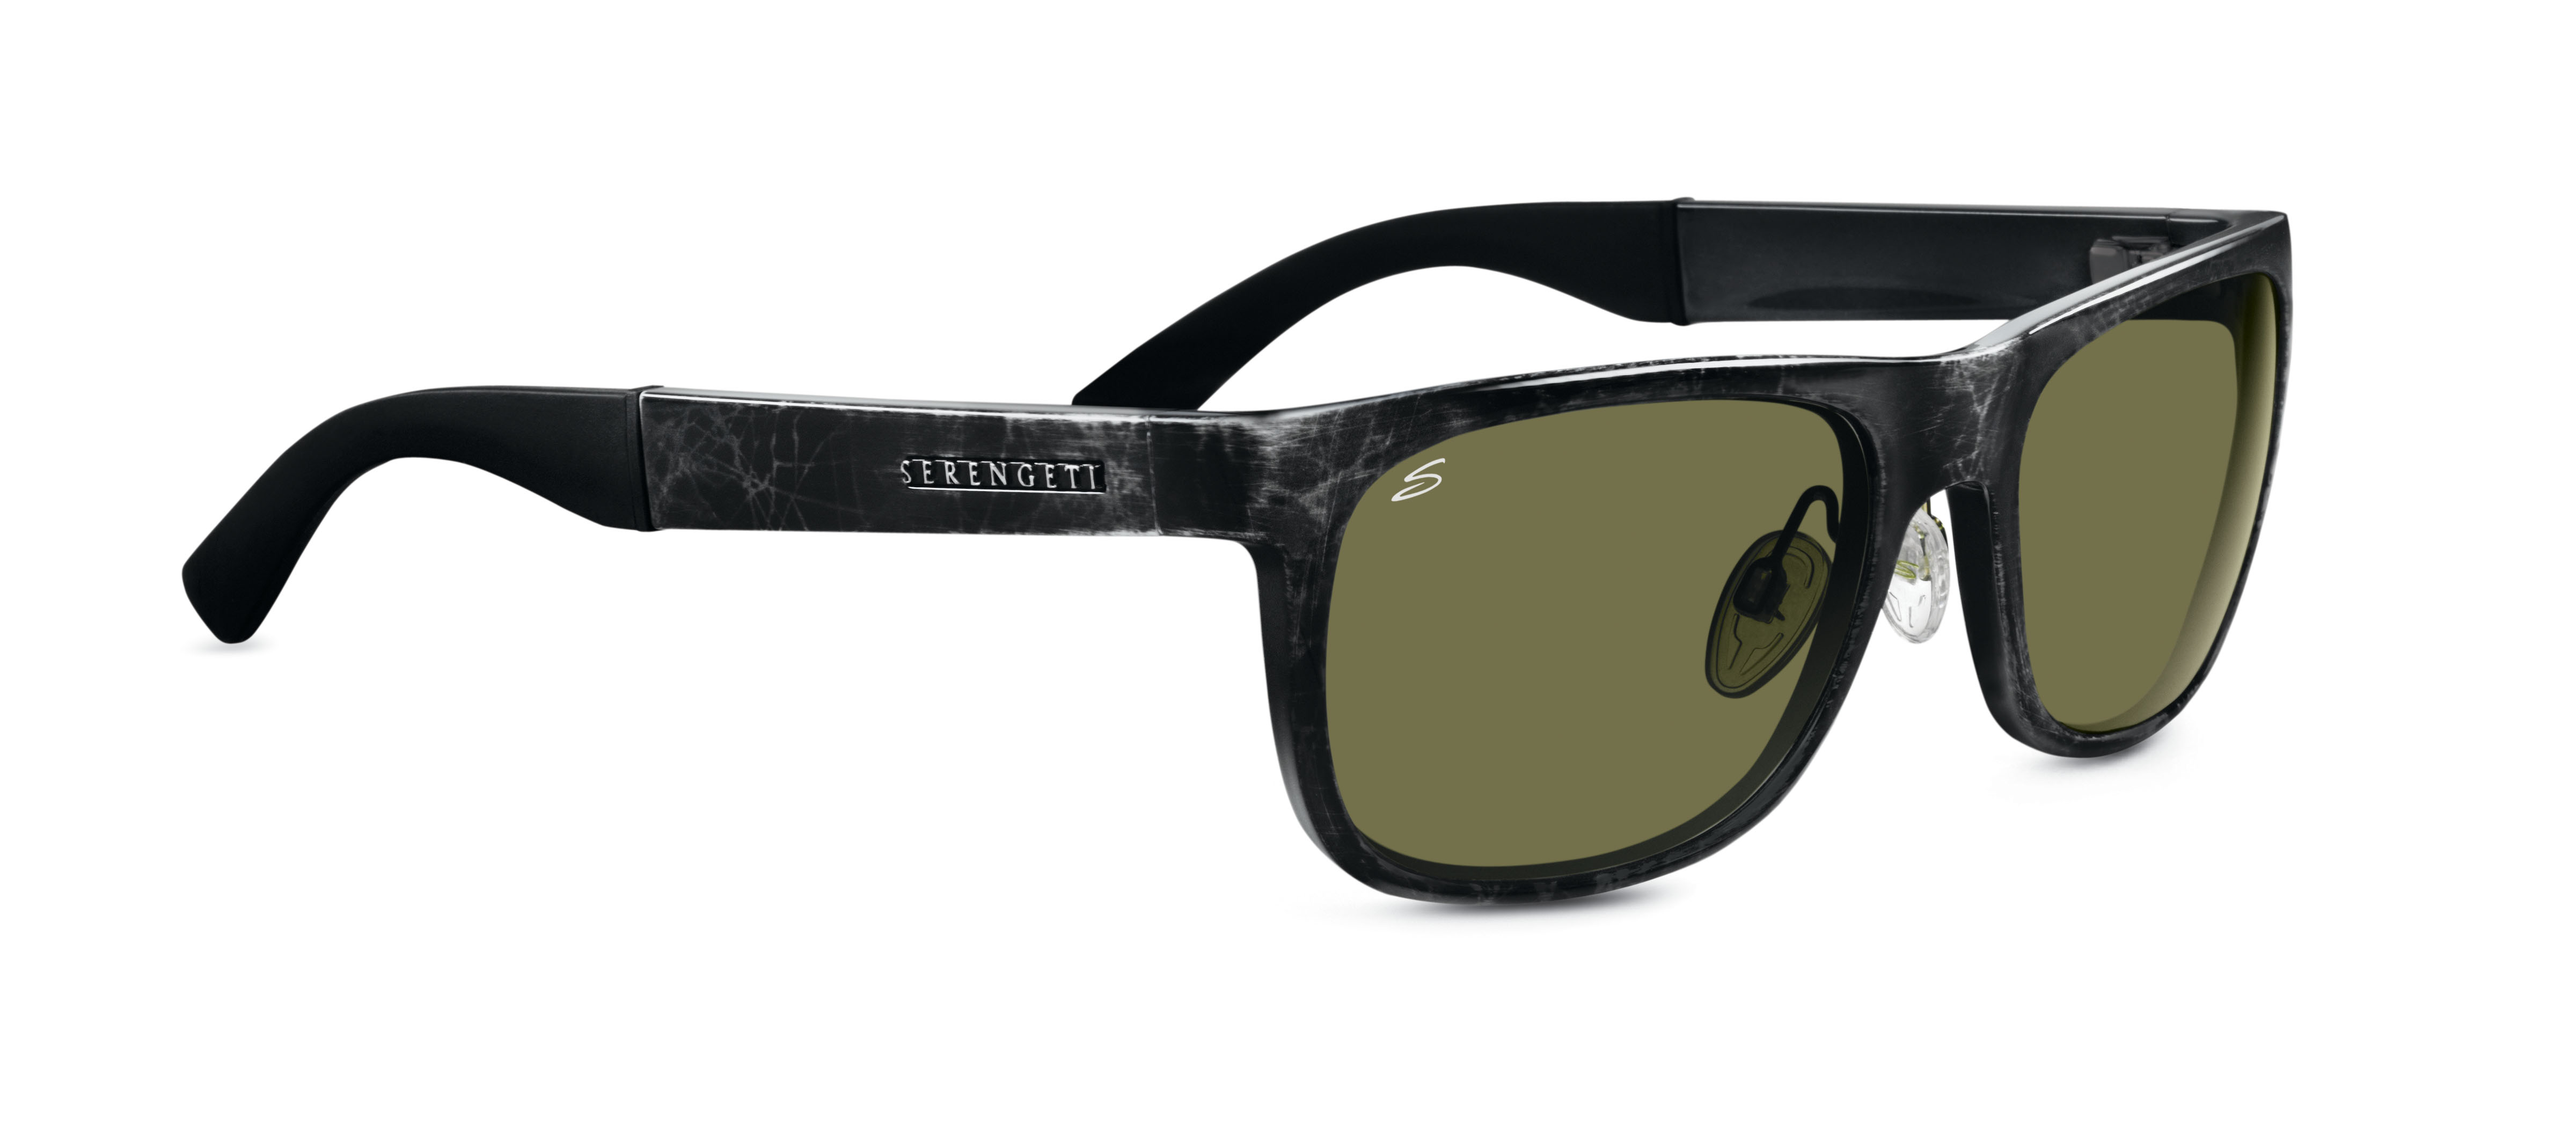 02e9e89c094c Serengeti Nico Sunglasses